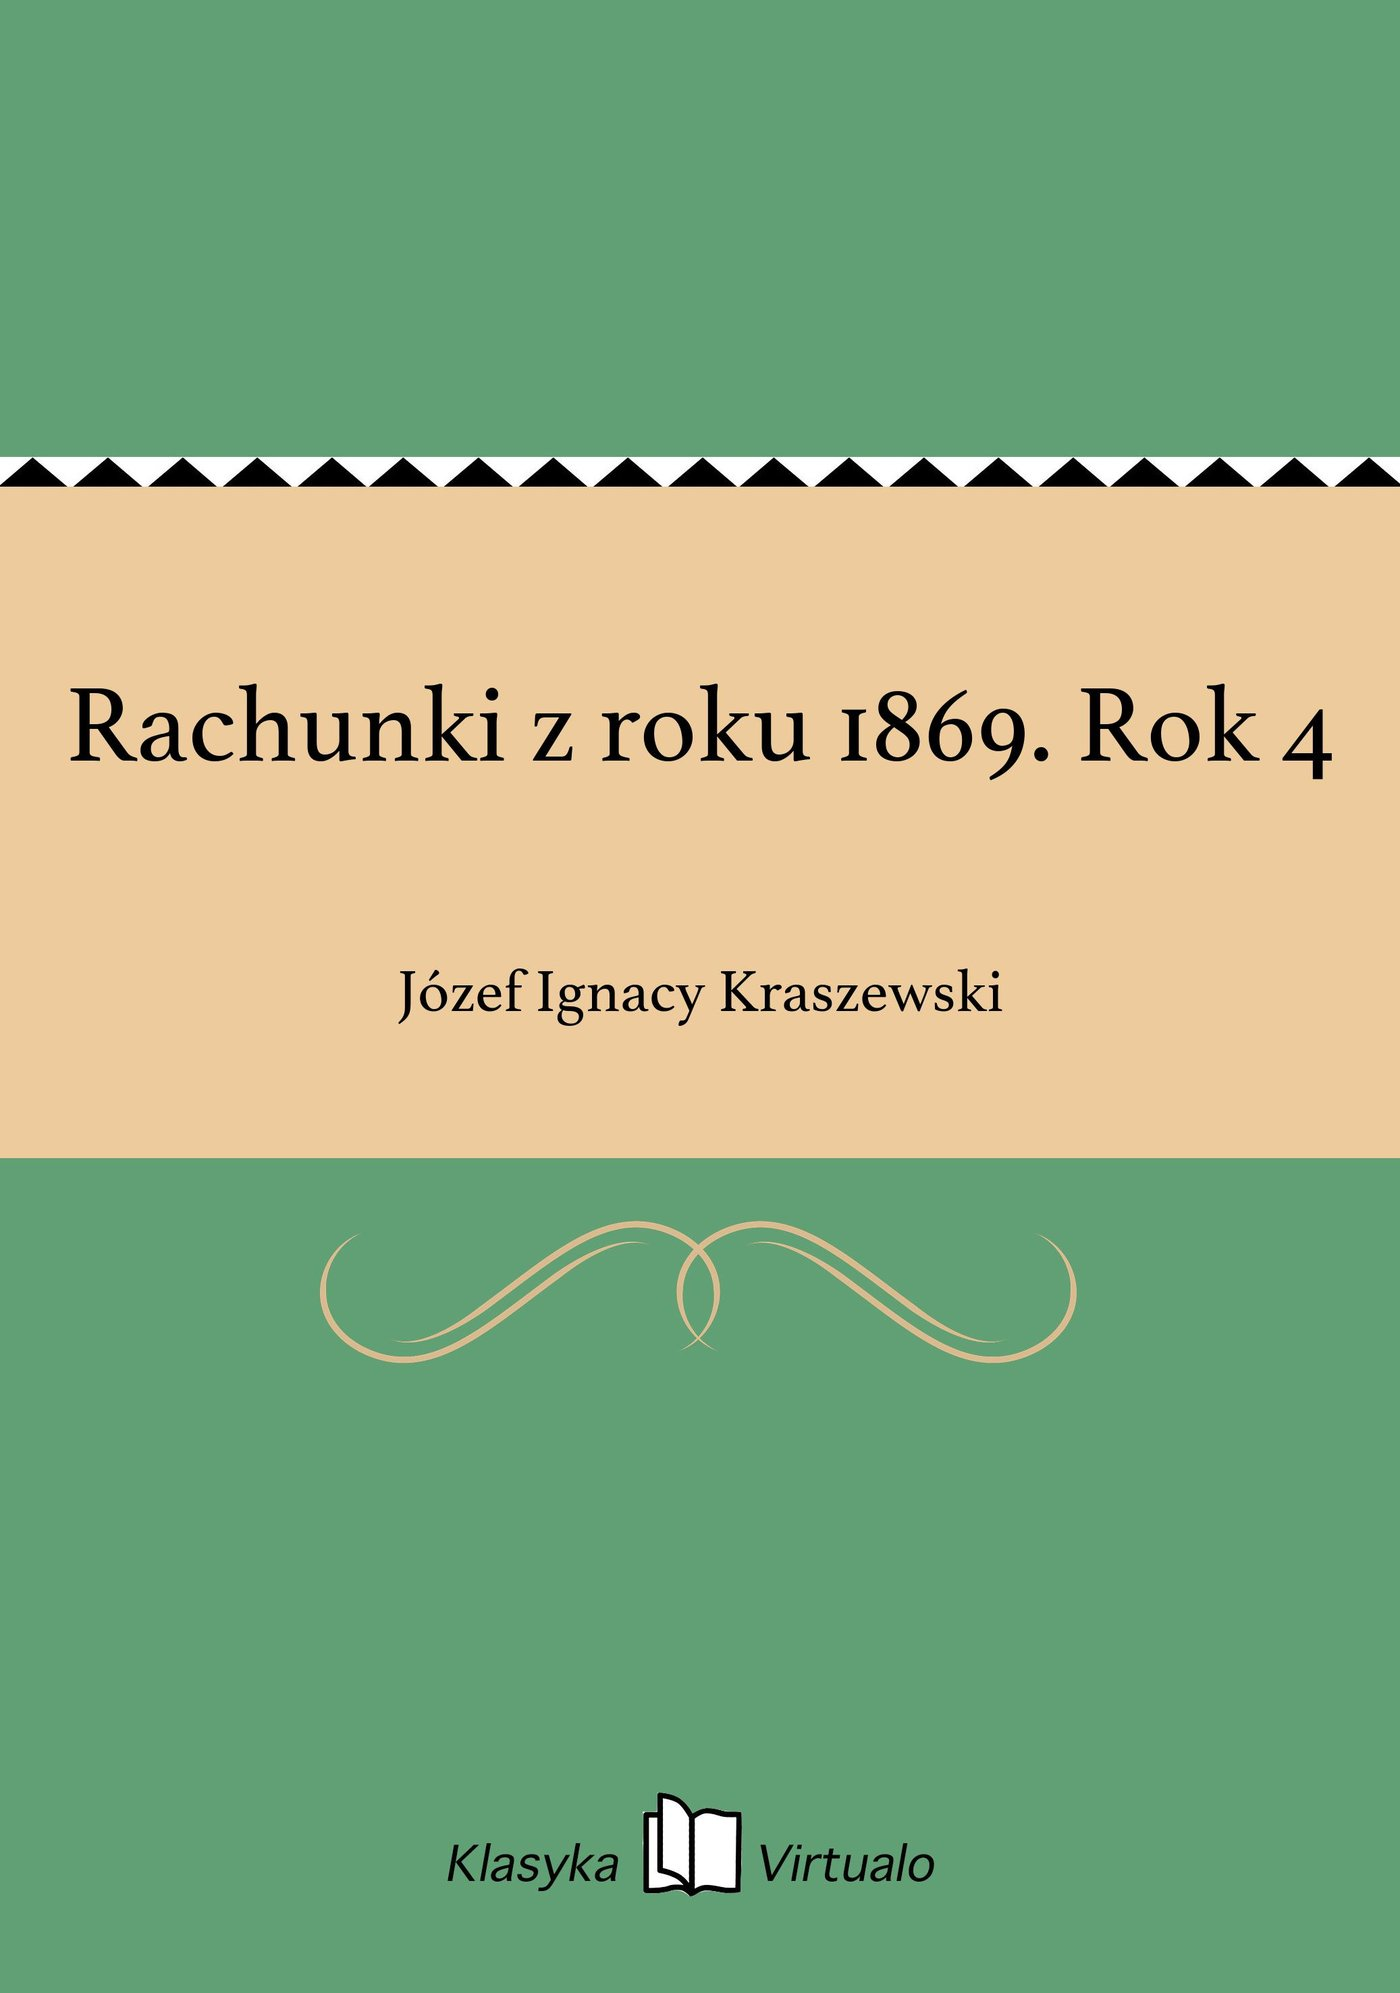 Rachunki z roku 1869. Rok 4 - Ebook (Książka EPUB) do pobrania w formacie EPUB